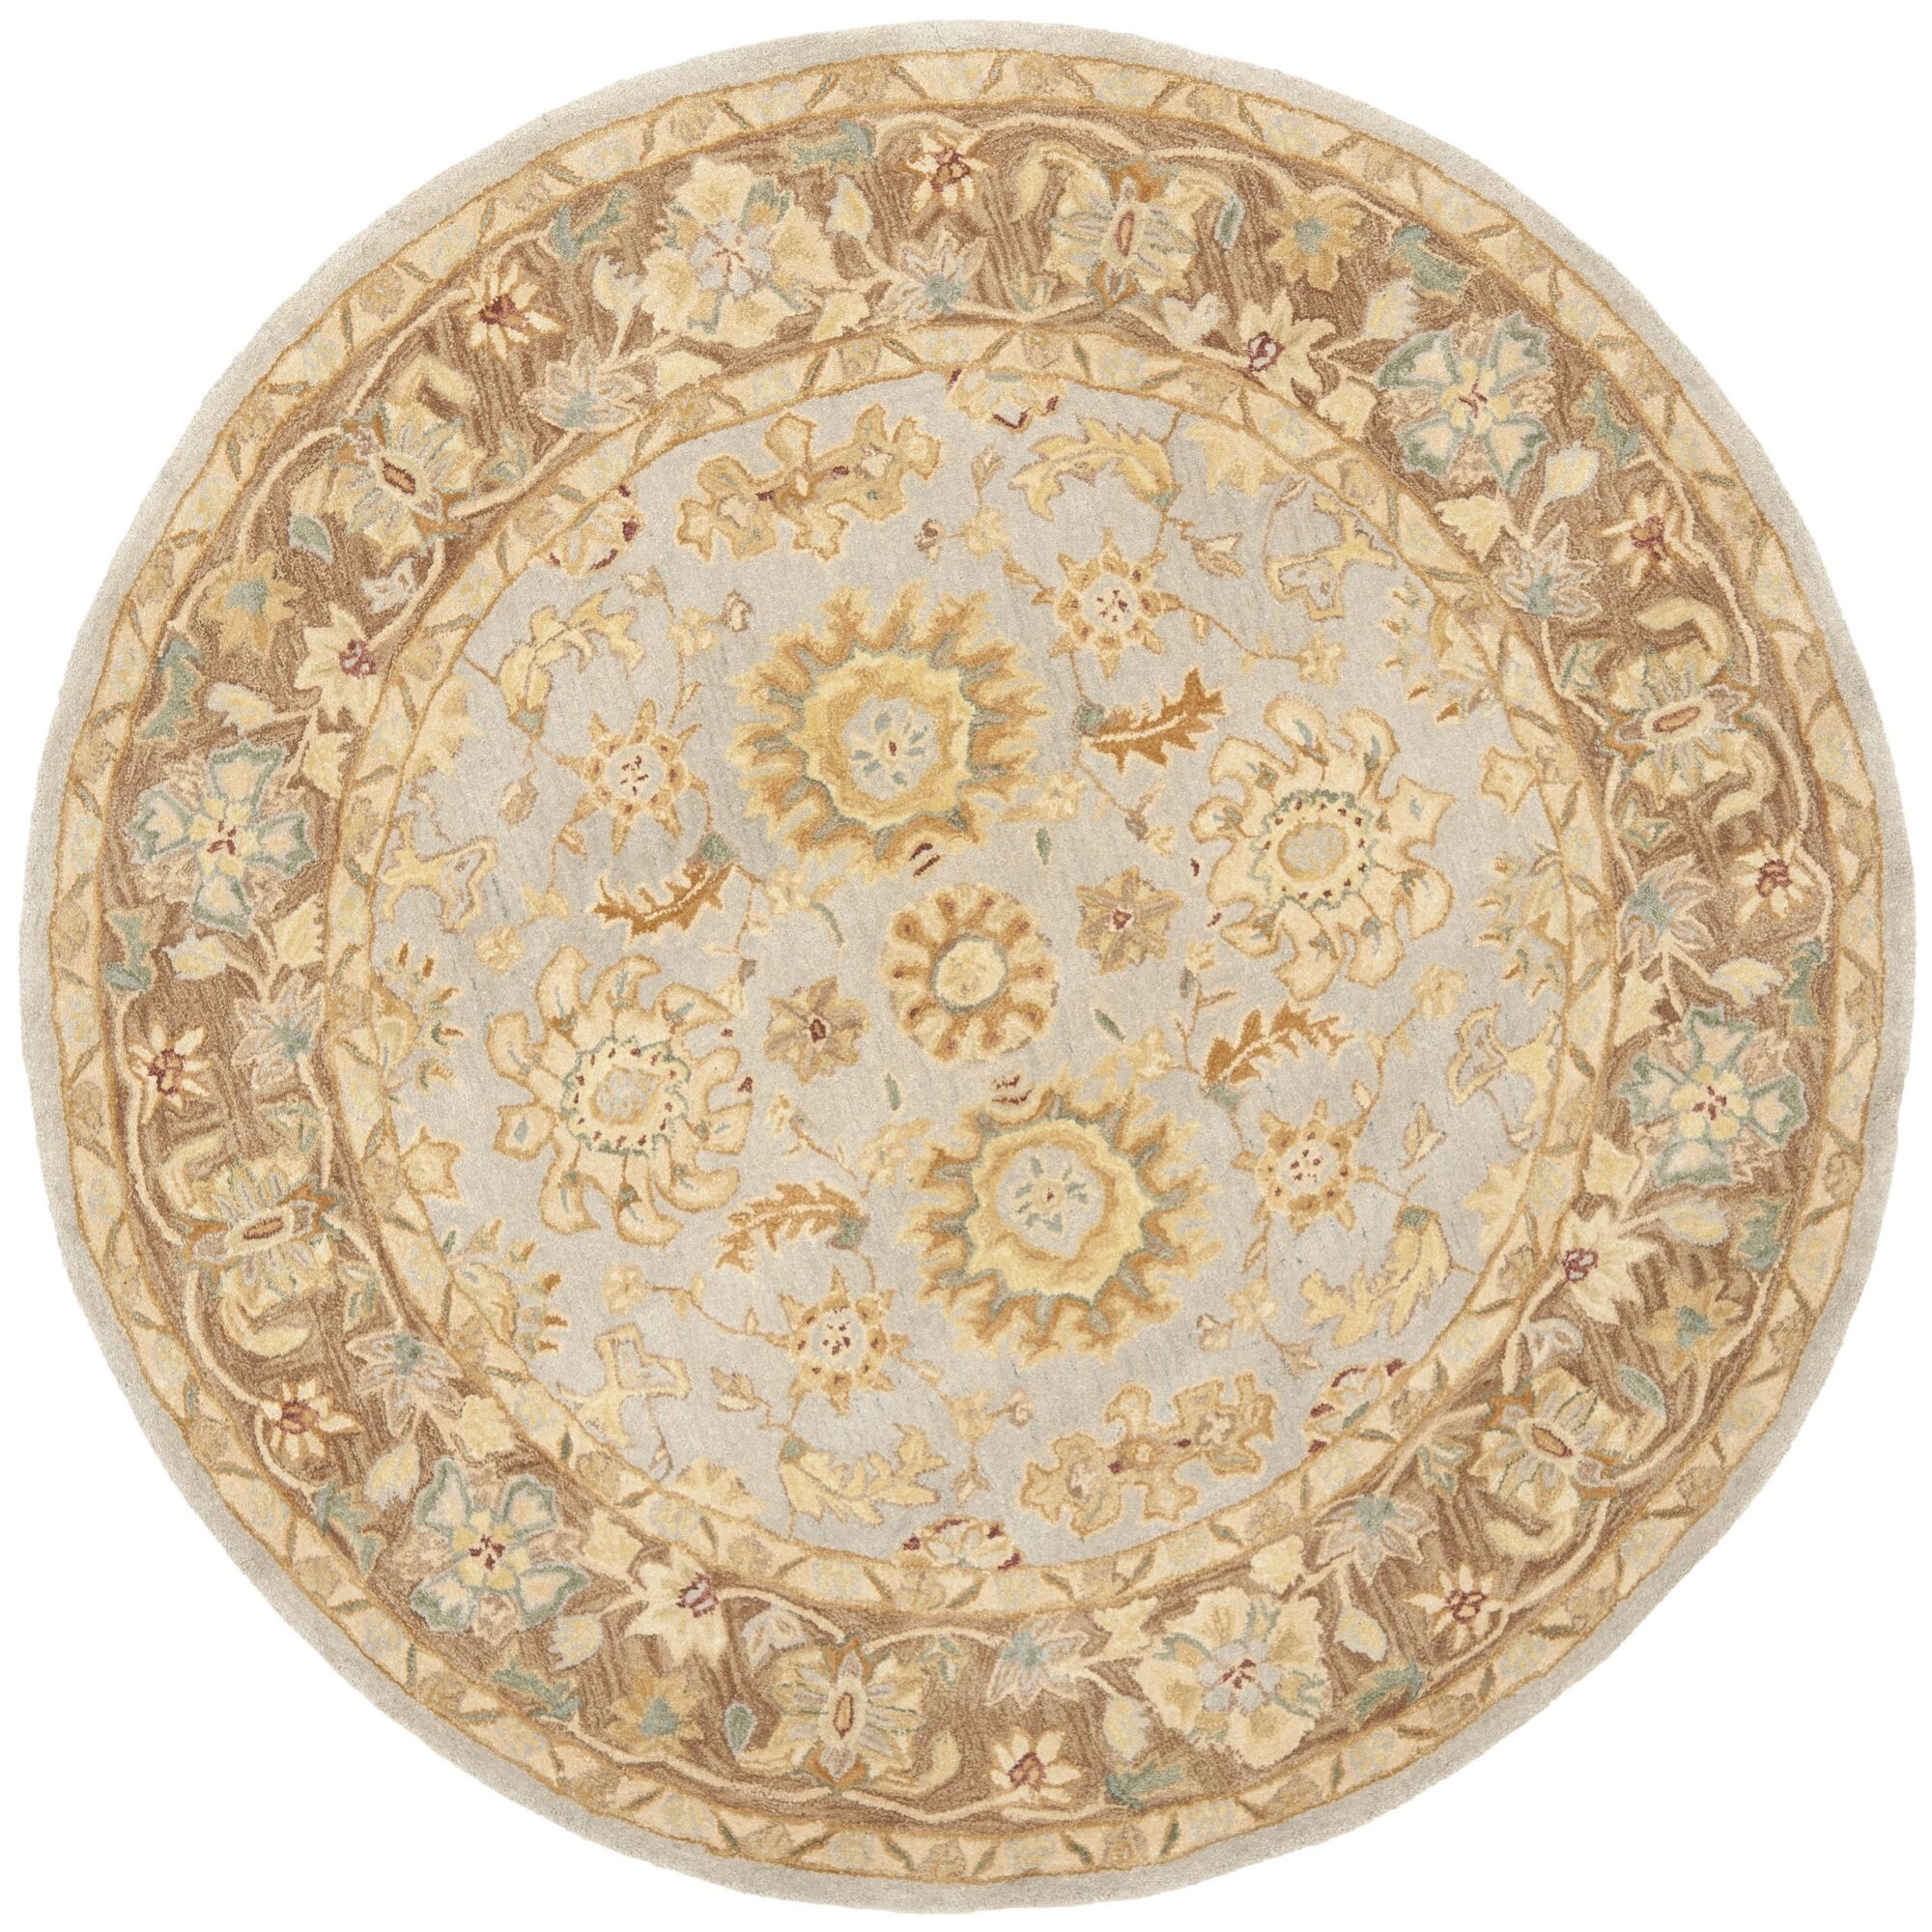 Anatolia Hand-Tufted Teal/Brown Area Rug Rug Size: Rectangle 9' x 12'